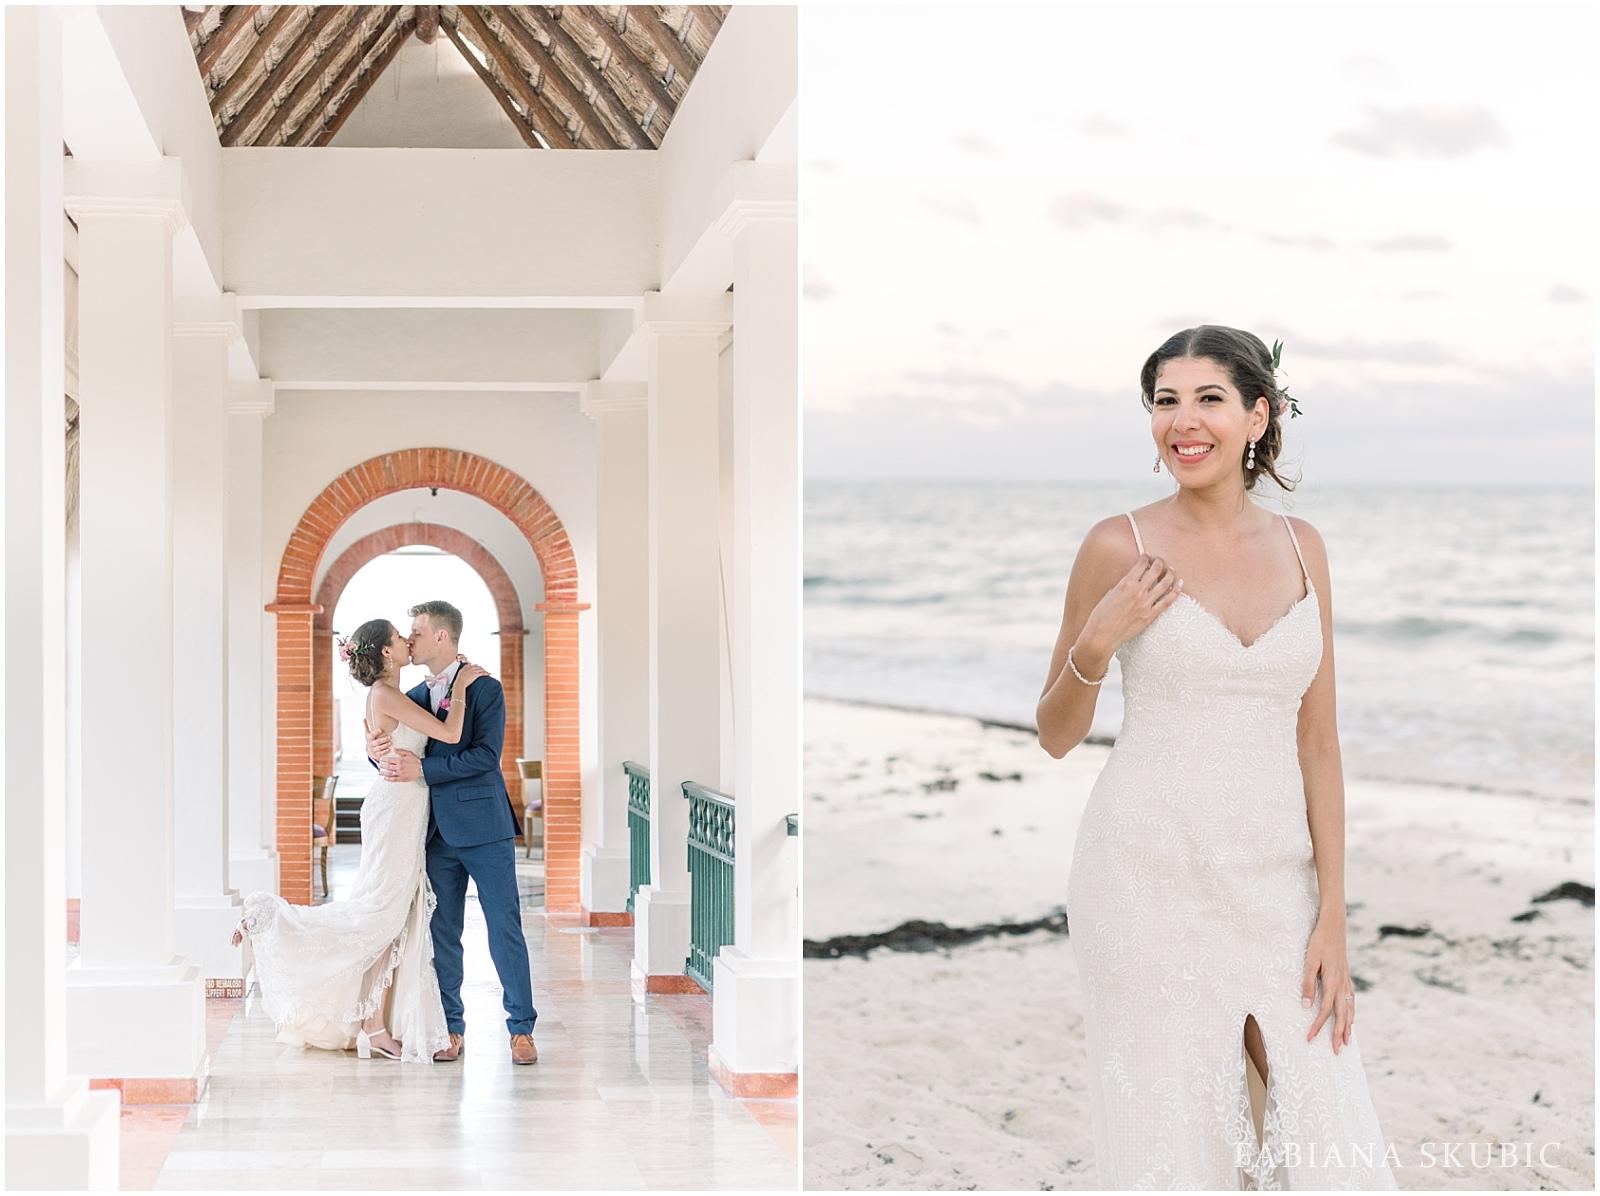 TJ_Now_Sapphire_Riviera_Cancun_Mexico_Wedding_Photos_0269.jpg